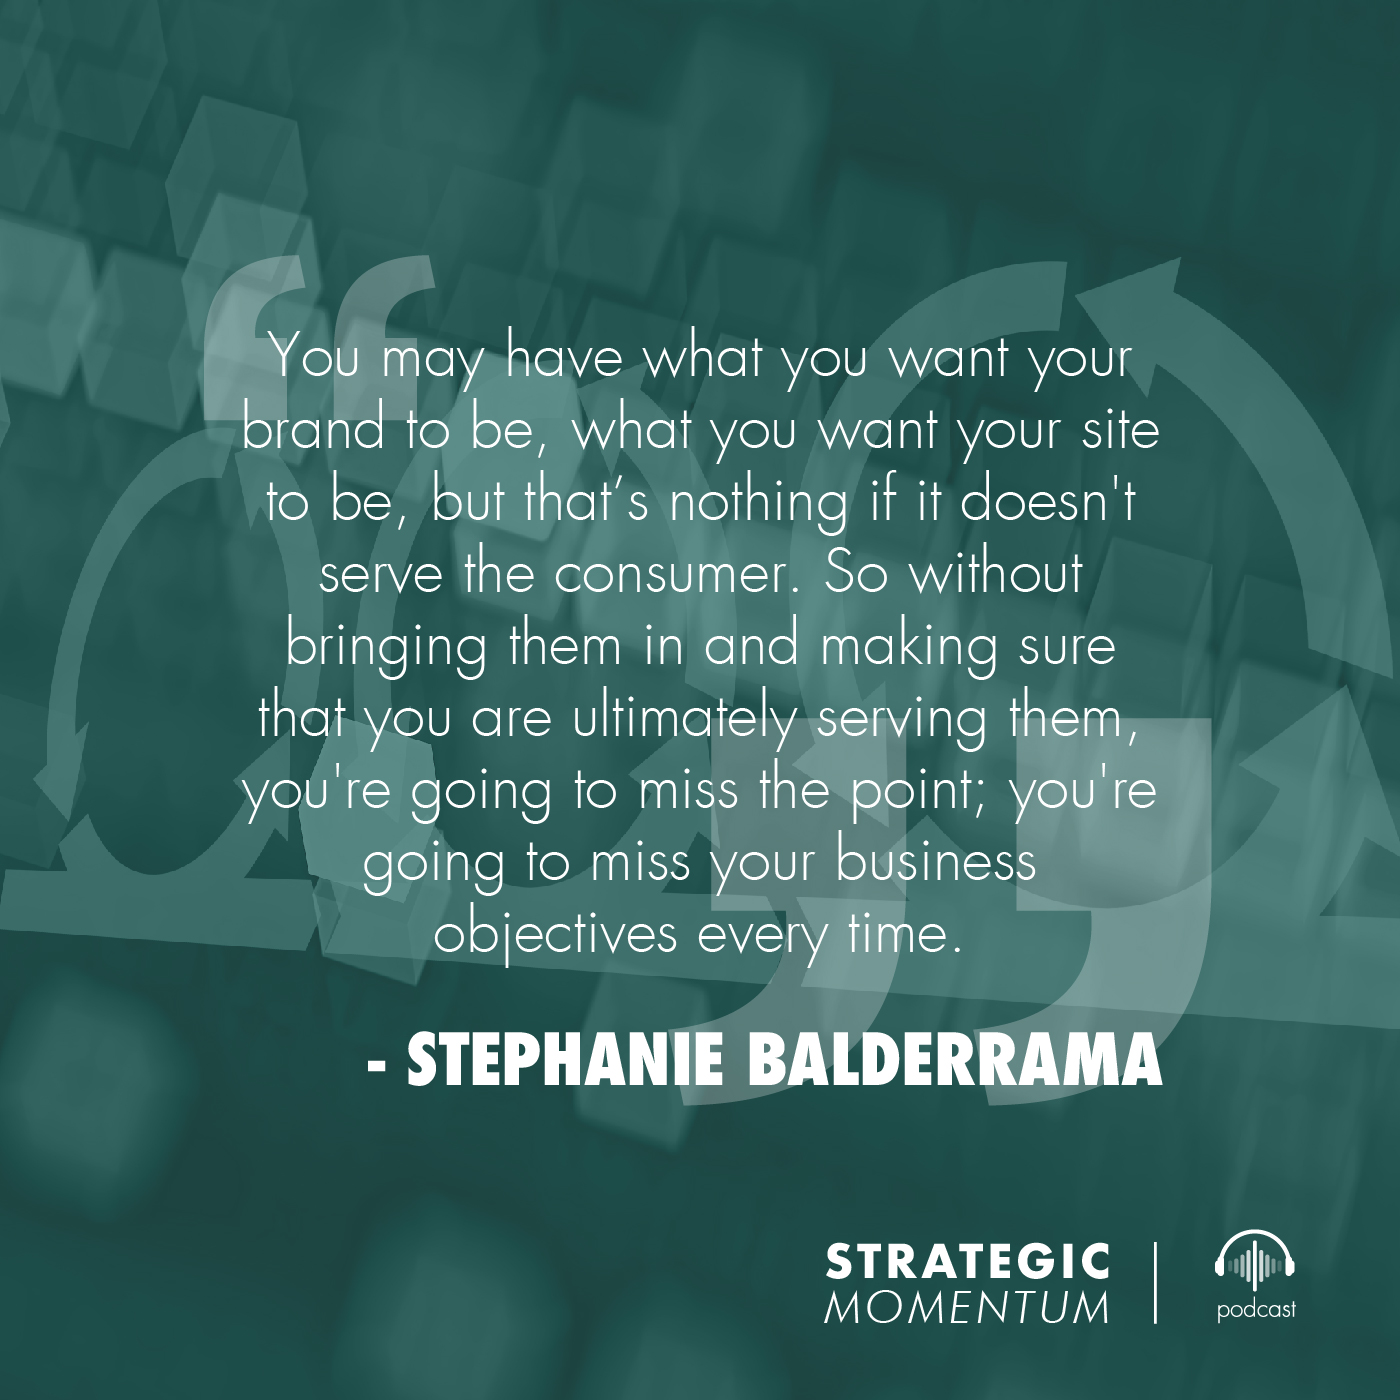 ConnieSteele_StephaniBalderrama_StrategicMomentum_Ep21_QTile3.jpg